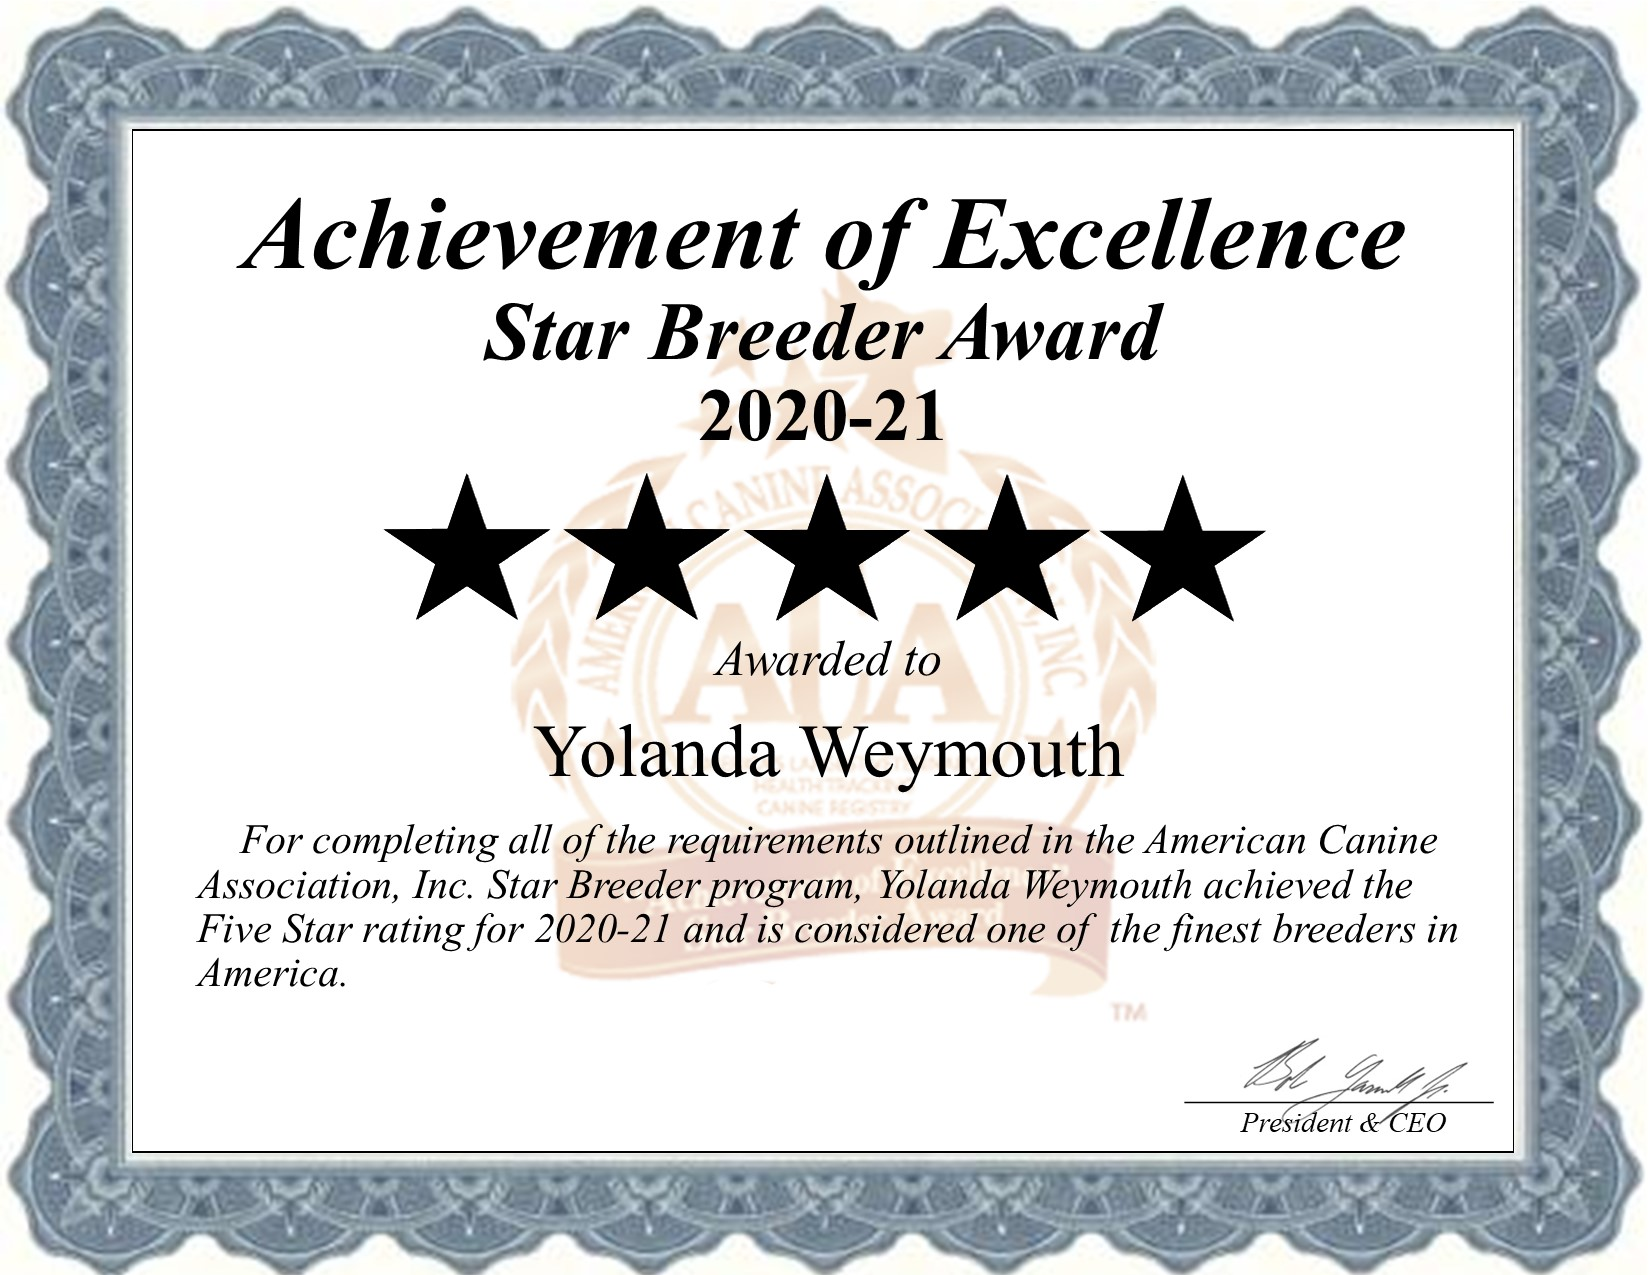 yolanda, weymouth, dog, breeder, phil, yolanda-weymouth, dog, breeder, subiaco, ar, arkansas, star, certificate, yorkshire, daschund, puppy, mill, puppymill, usda, 71-a-0874, 71a0874, inspection, records, kennel